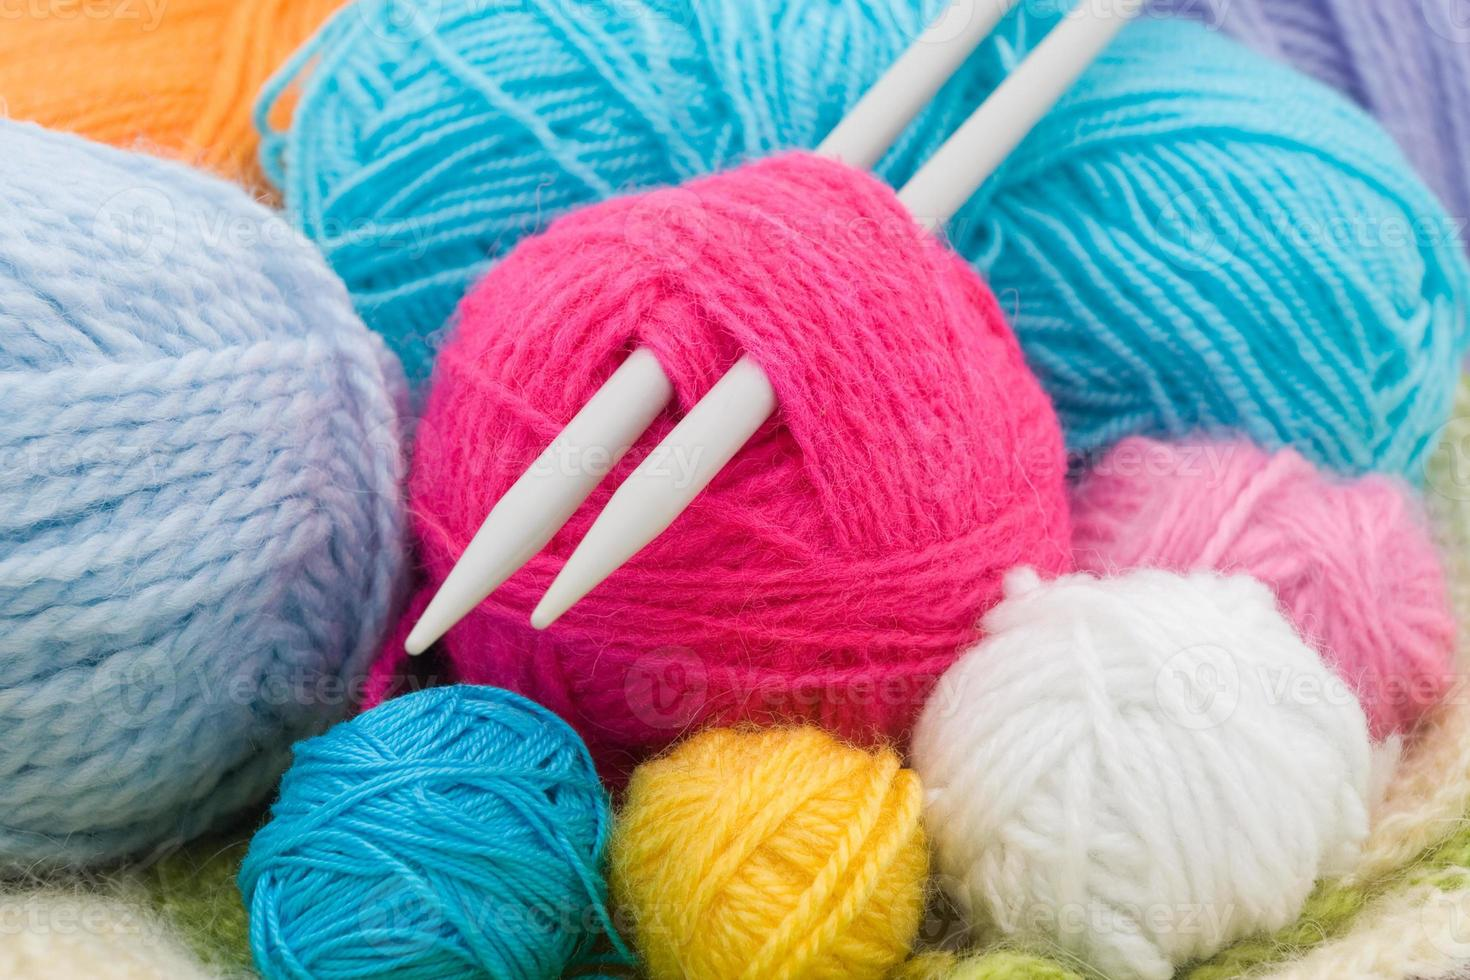 ovillos de lana foto